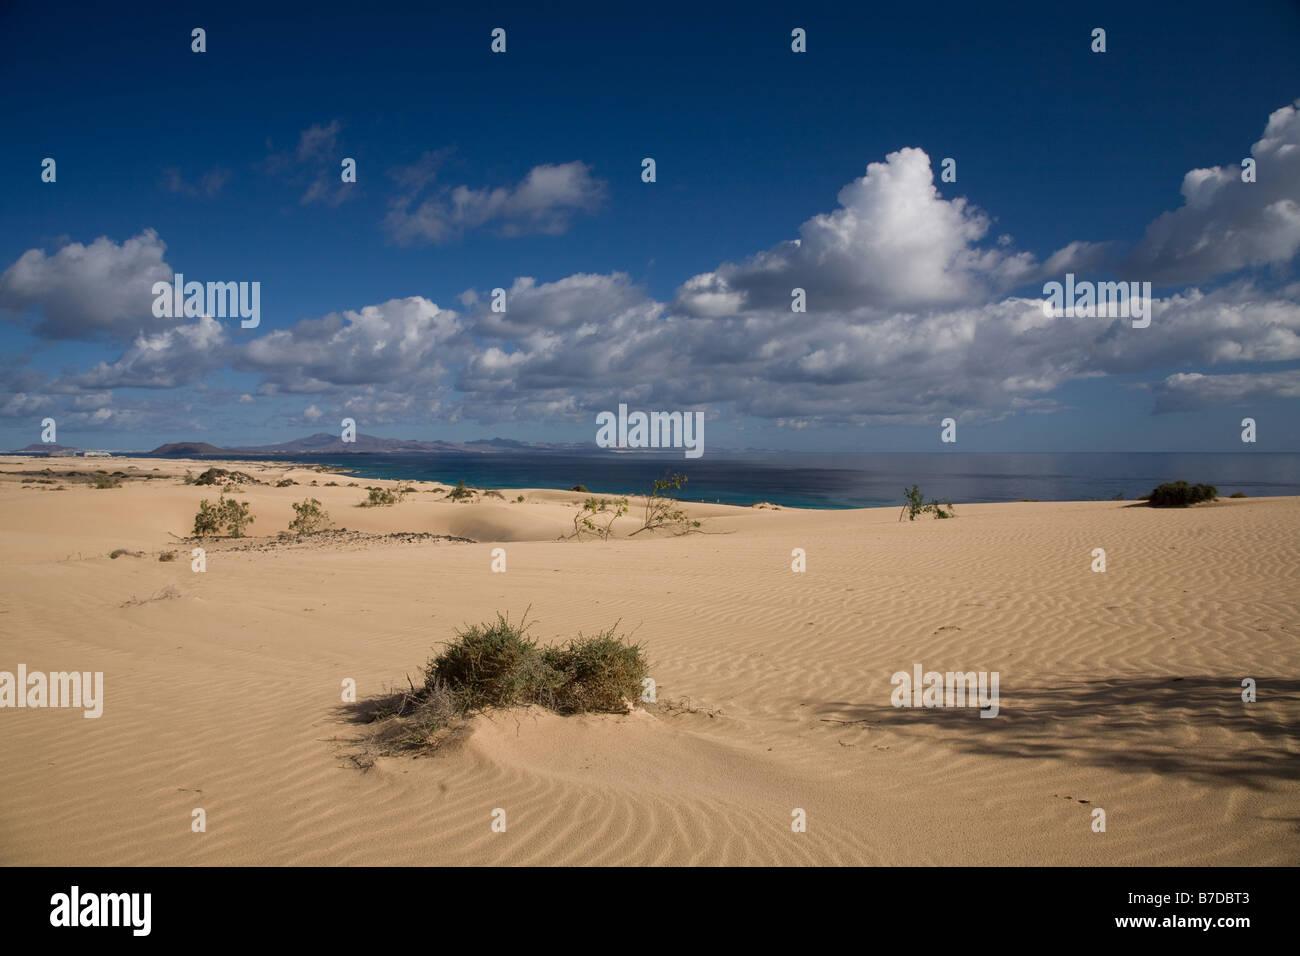 Sahara like desert on Fuerteventura. Dunas de Corralejo. Sand dunes in a volcanic landscape next to the sea - Stock Image